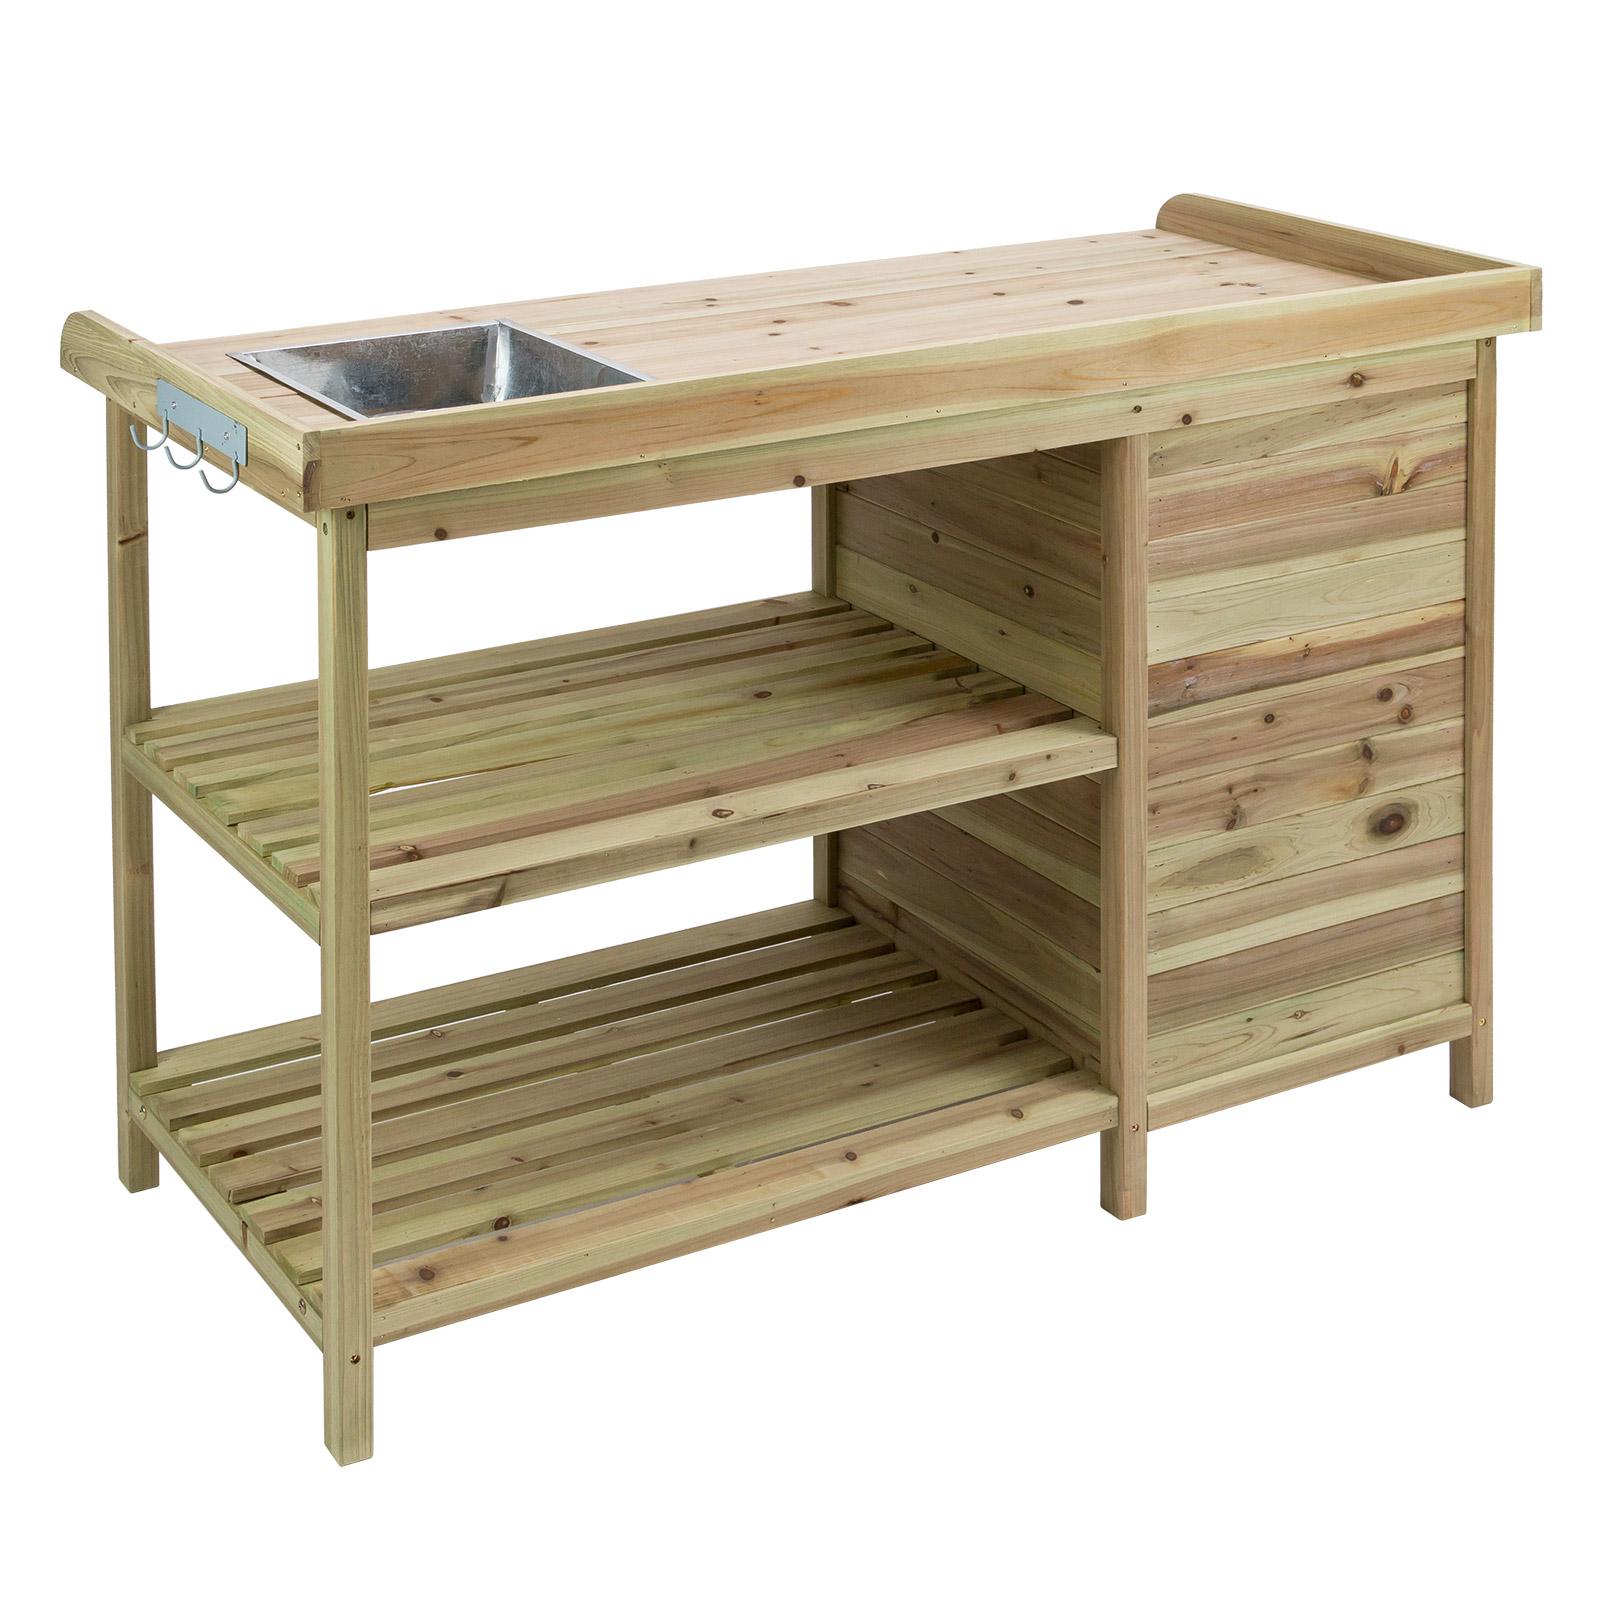 17030920180202 pflanztisch holz bauanleitung inspiration. Black Bedroom Furniture Sets. Home Design Ideas